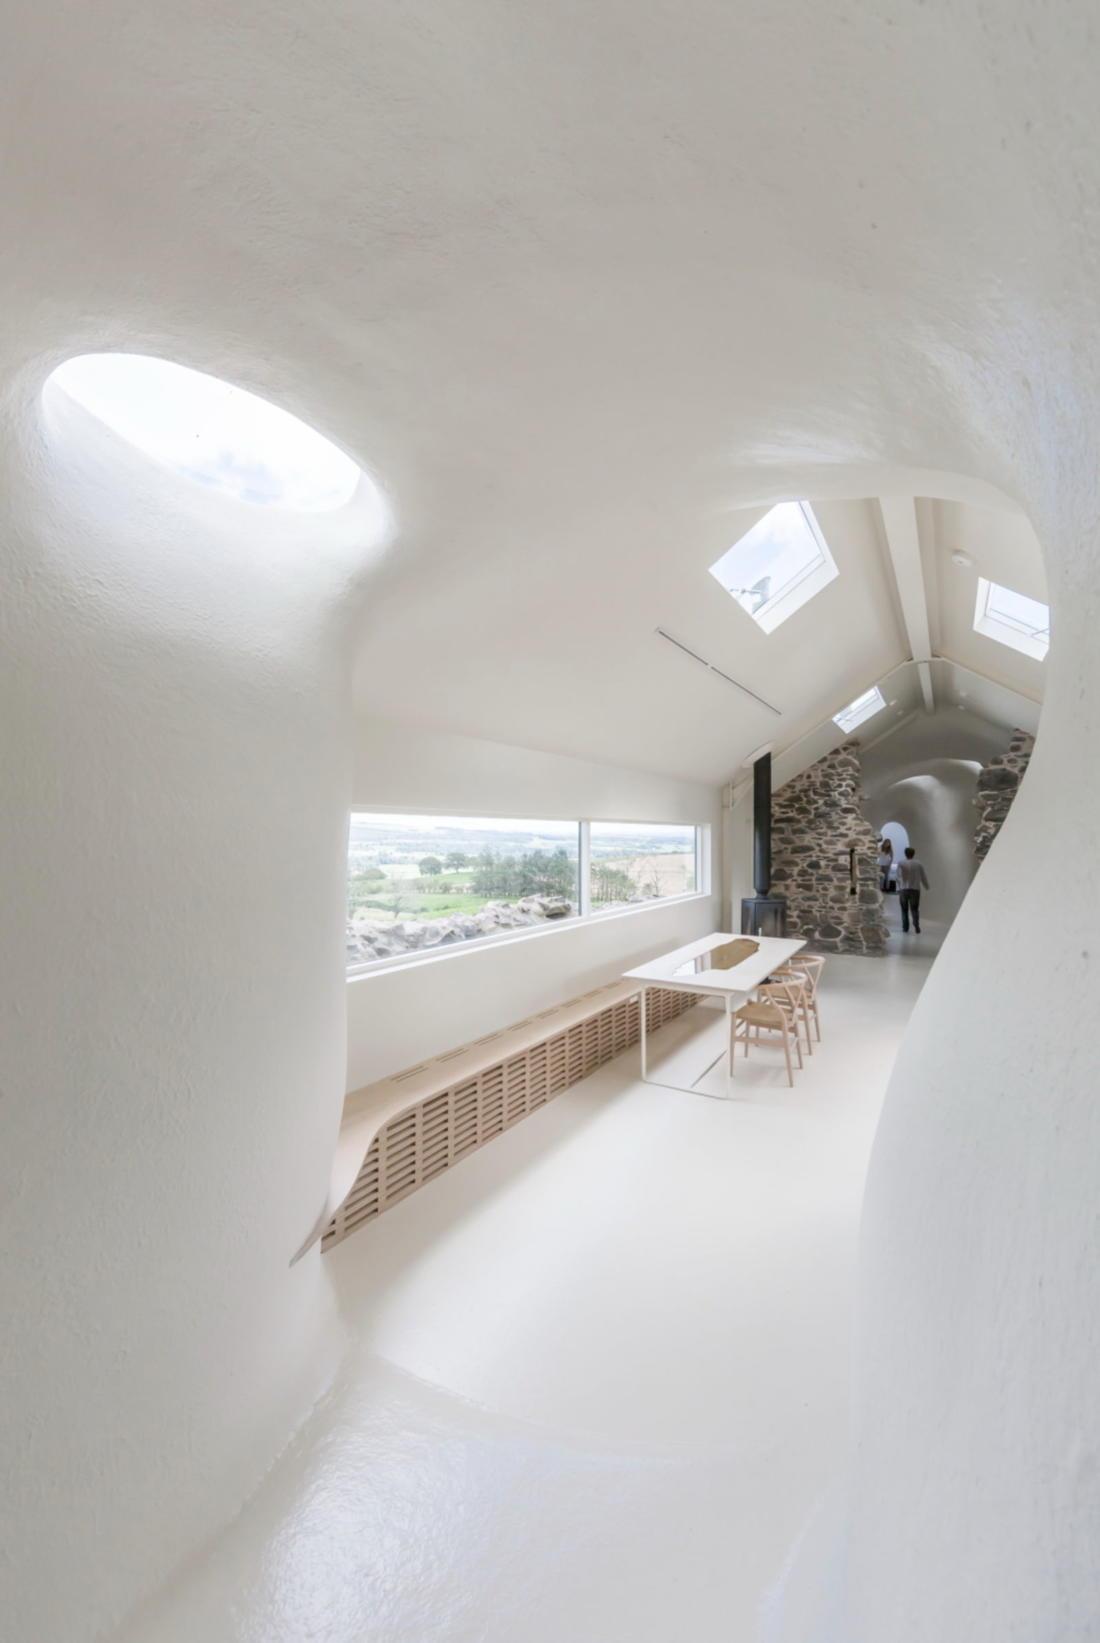 Совместный проект студий Lily Jencks и Nathanael Dorent Architecture 44